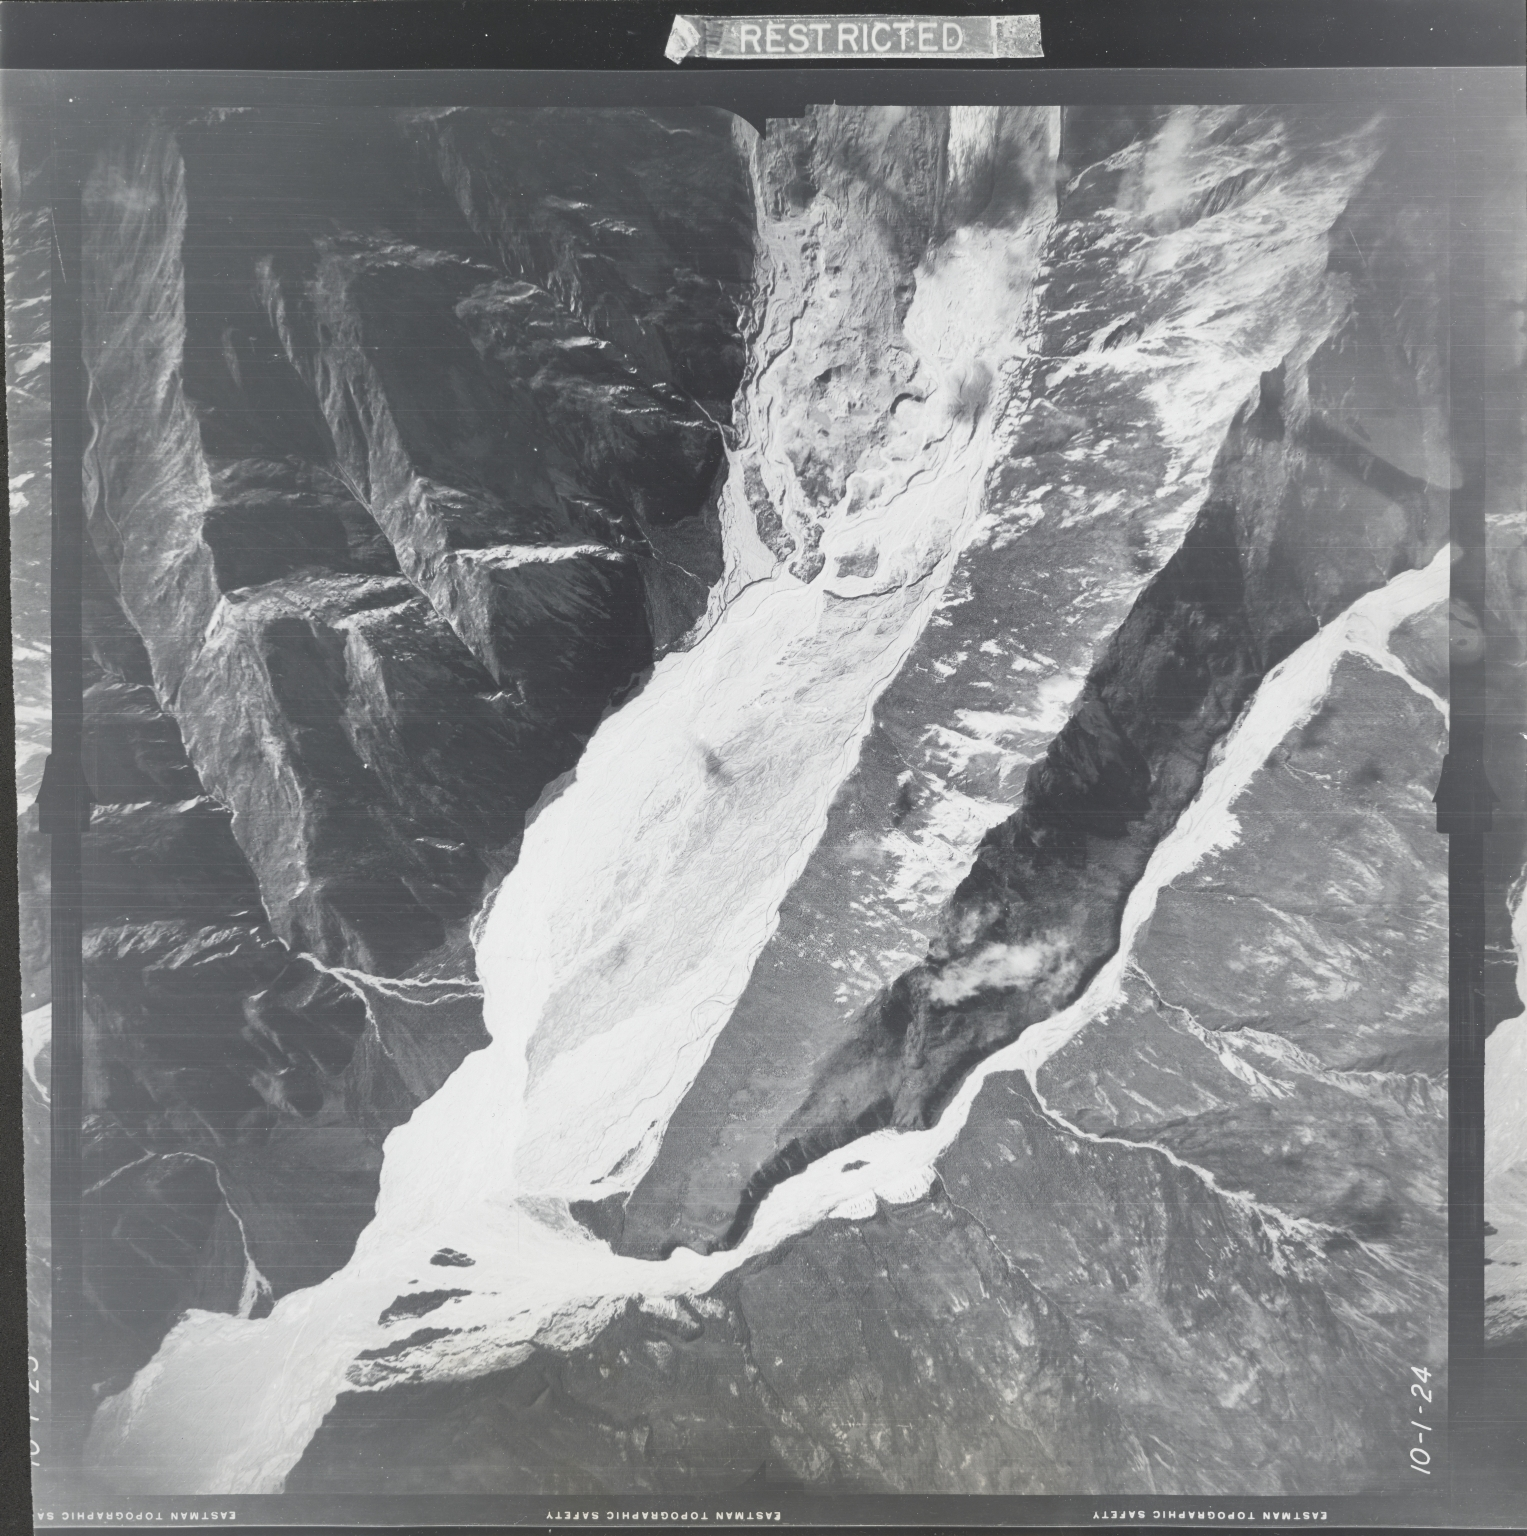 At head of Gerstle River, aerial photograph FL 18 V-24, Alaska